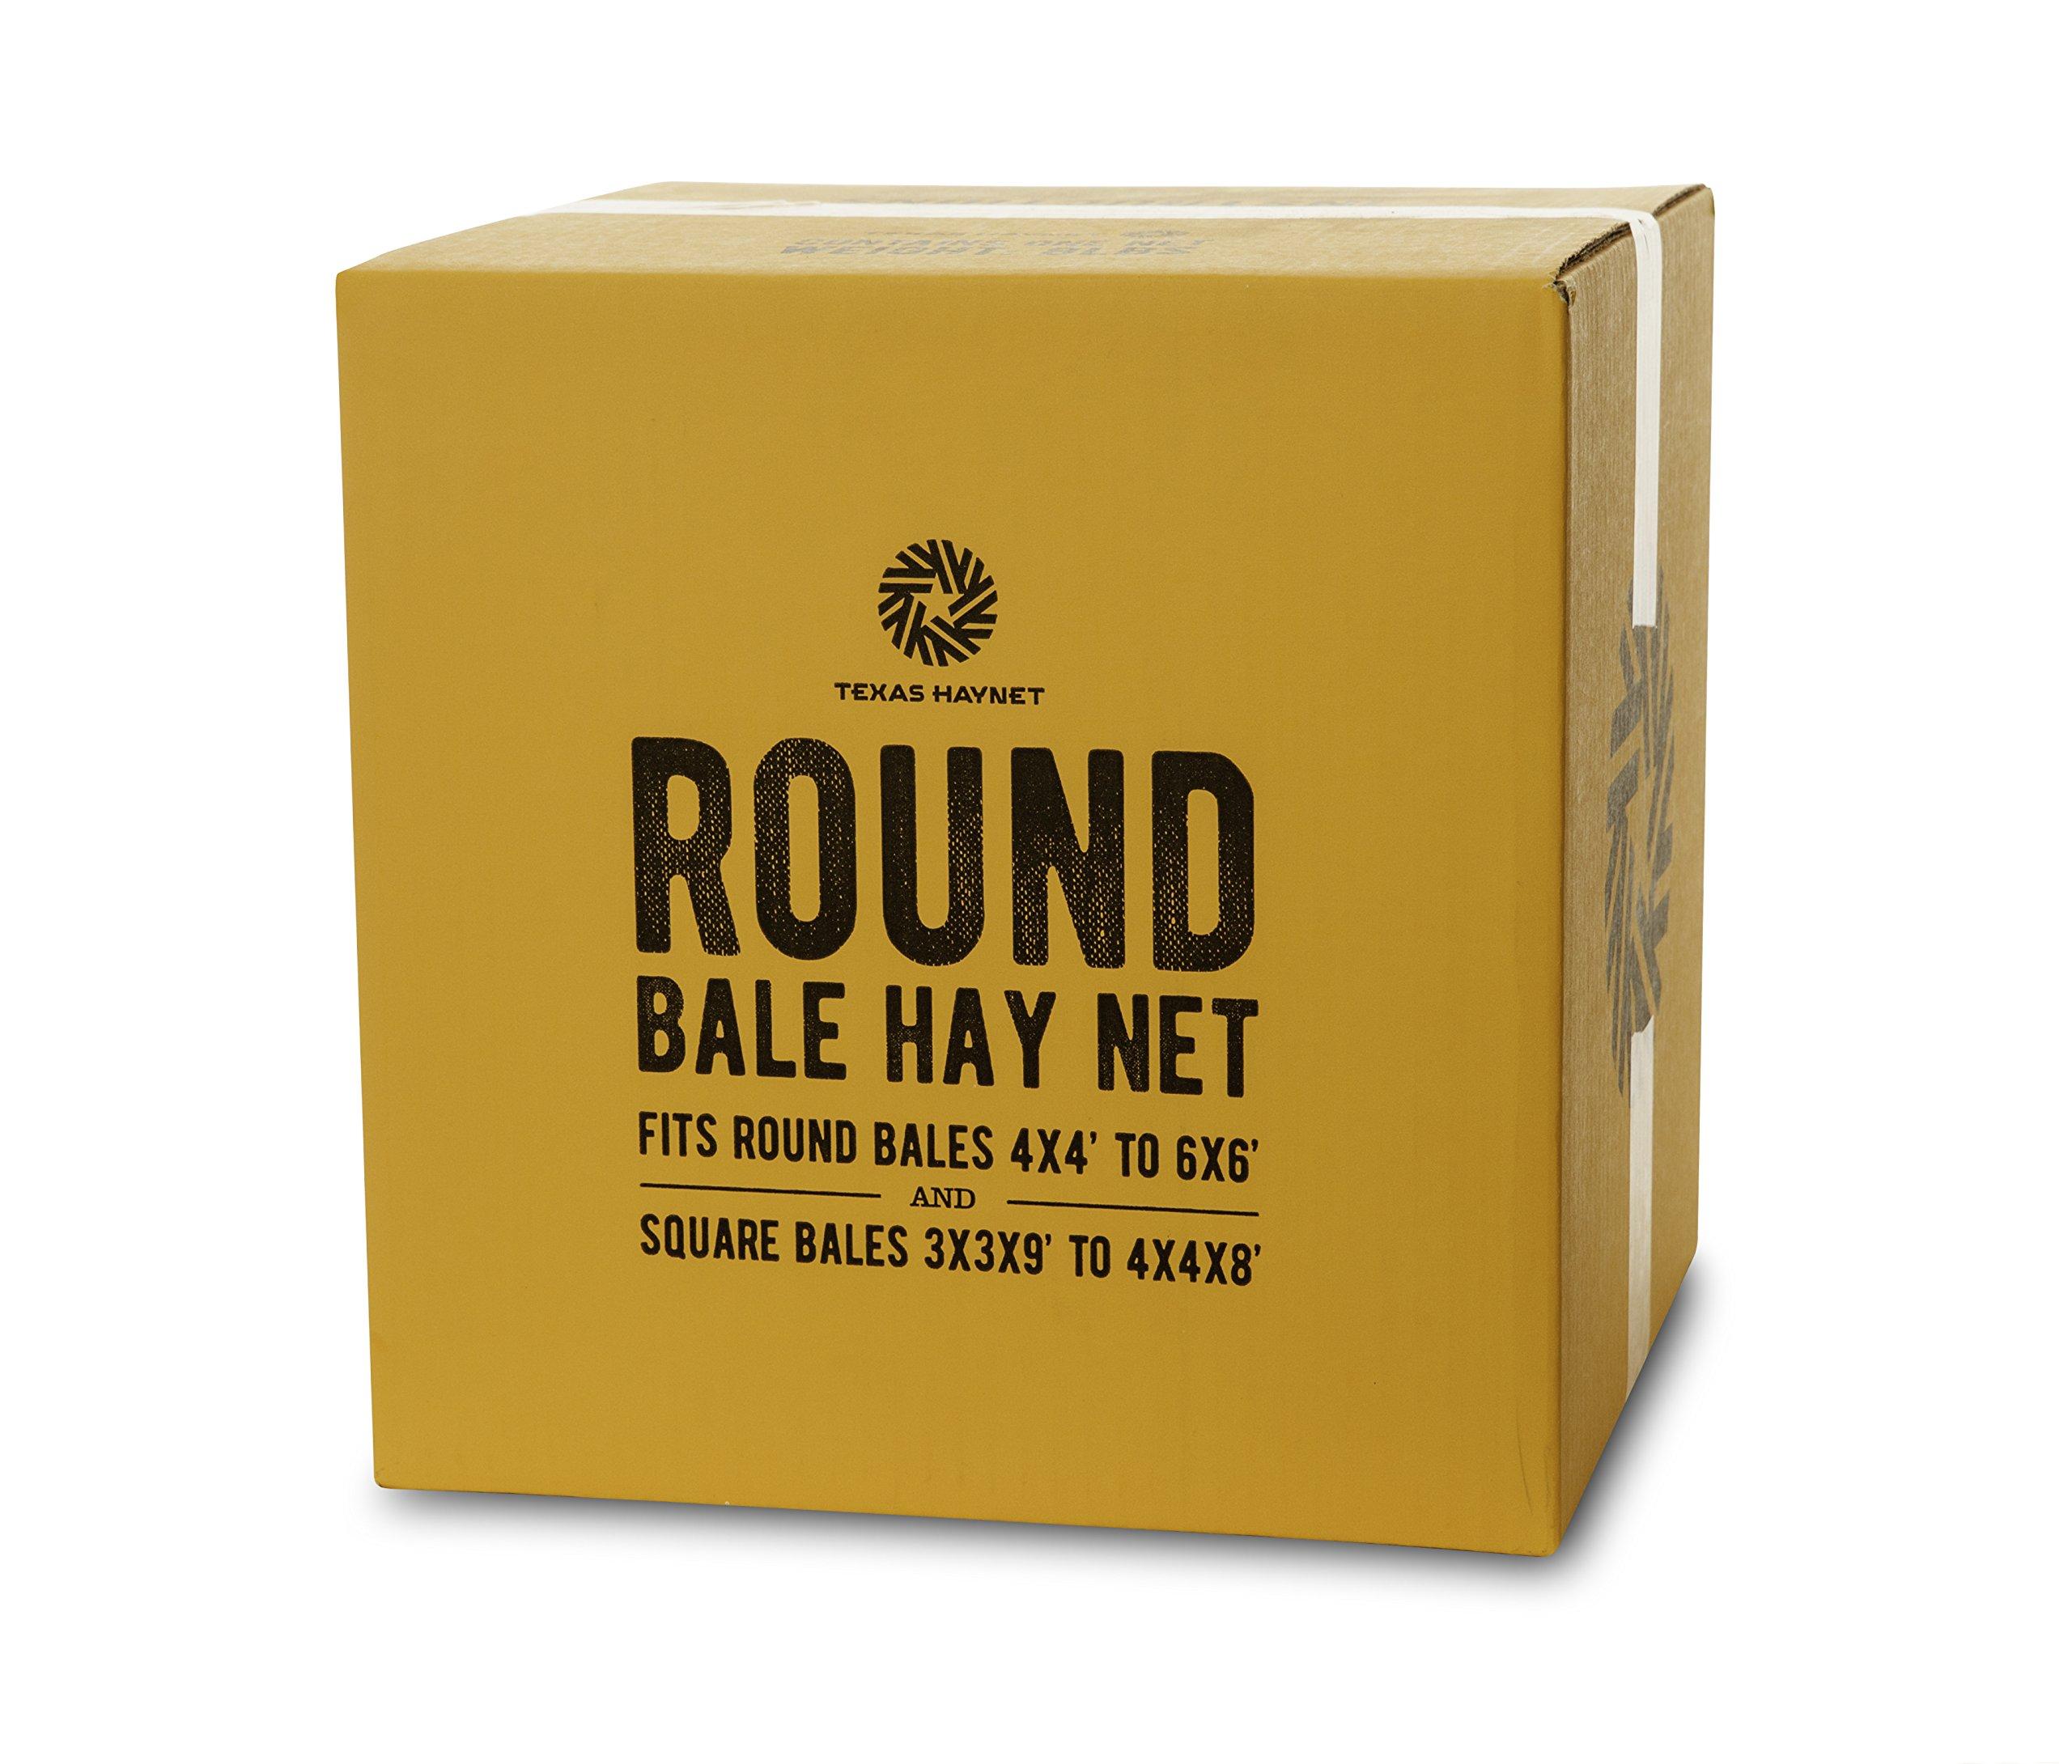 Texas Haynet Round Bale Hay Net Slow Feed Nylon Fits Bales 4x4-6x6 1.75'' Holes Made in America by Texas Haynet